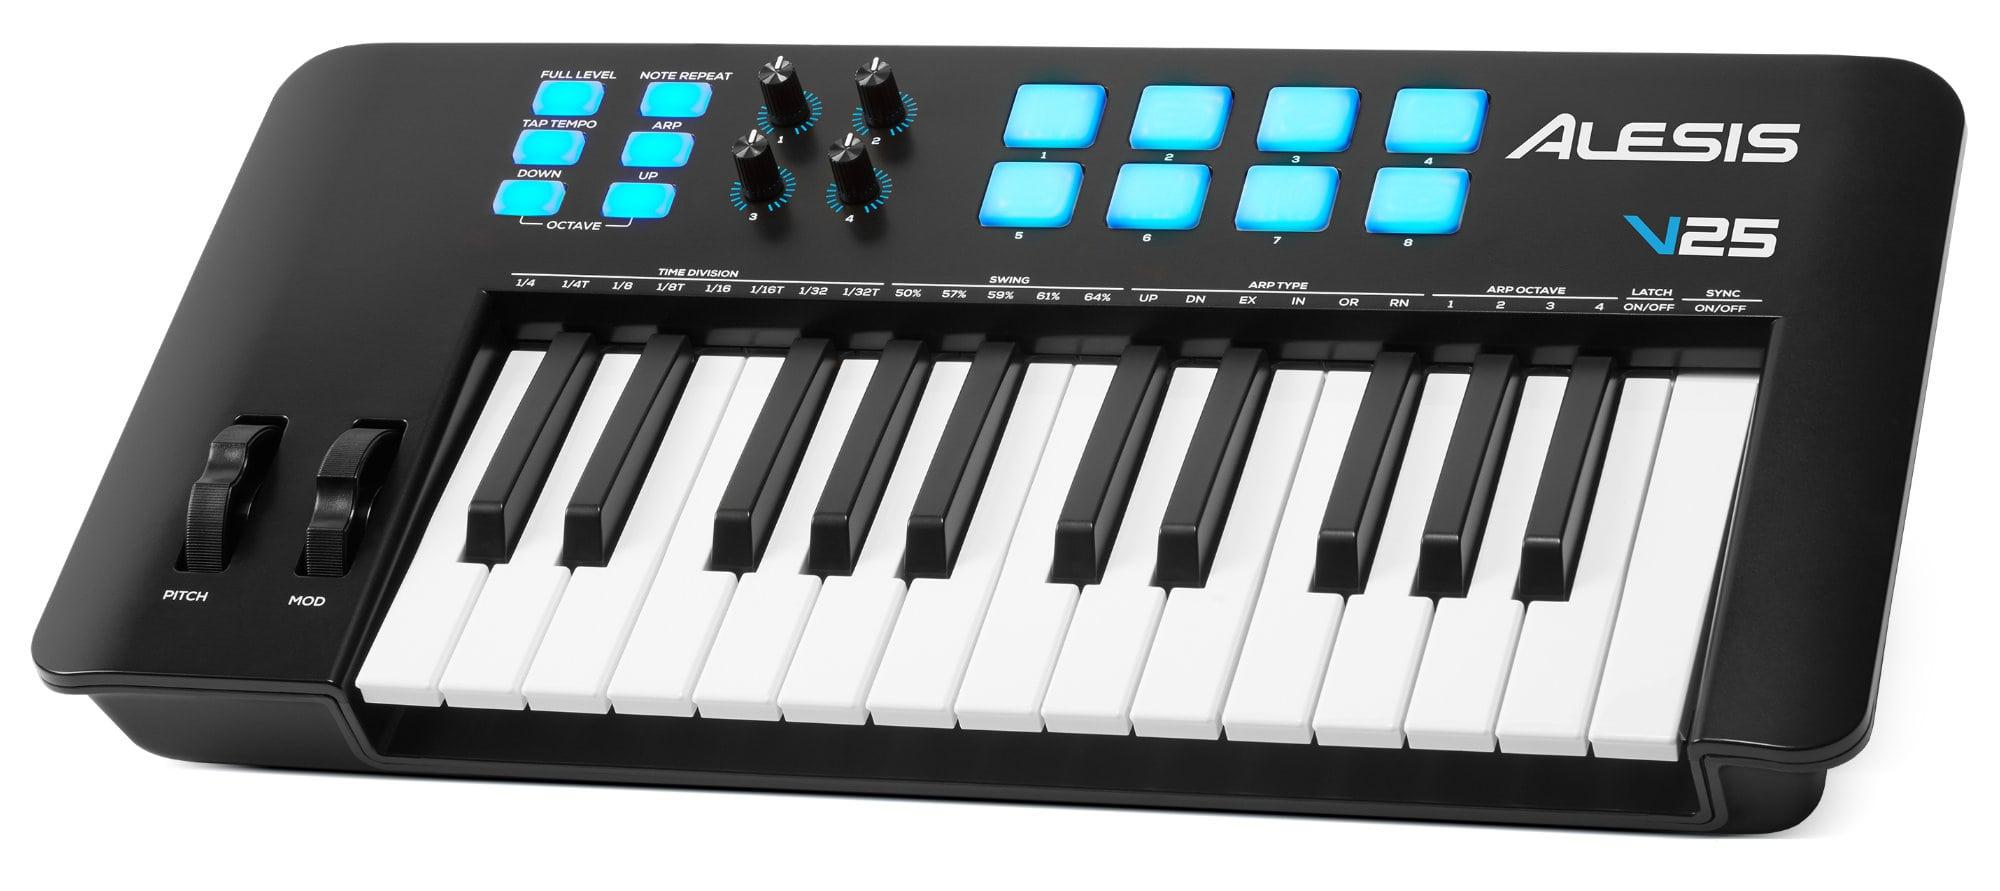 Midimasterkeyboards - Alesis V25 MKII MIDI Controller Keyboard - Onlineshop Musikhaus Kirstein